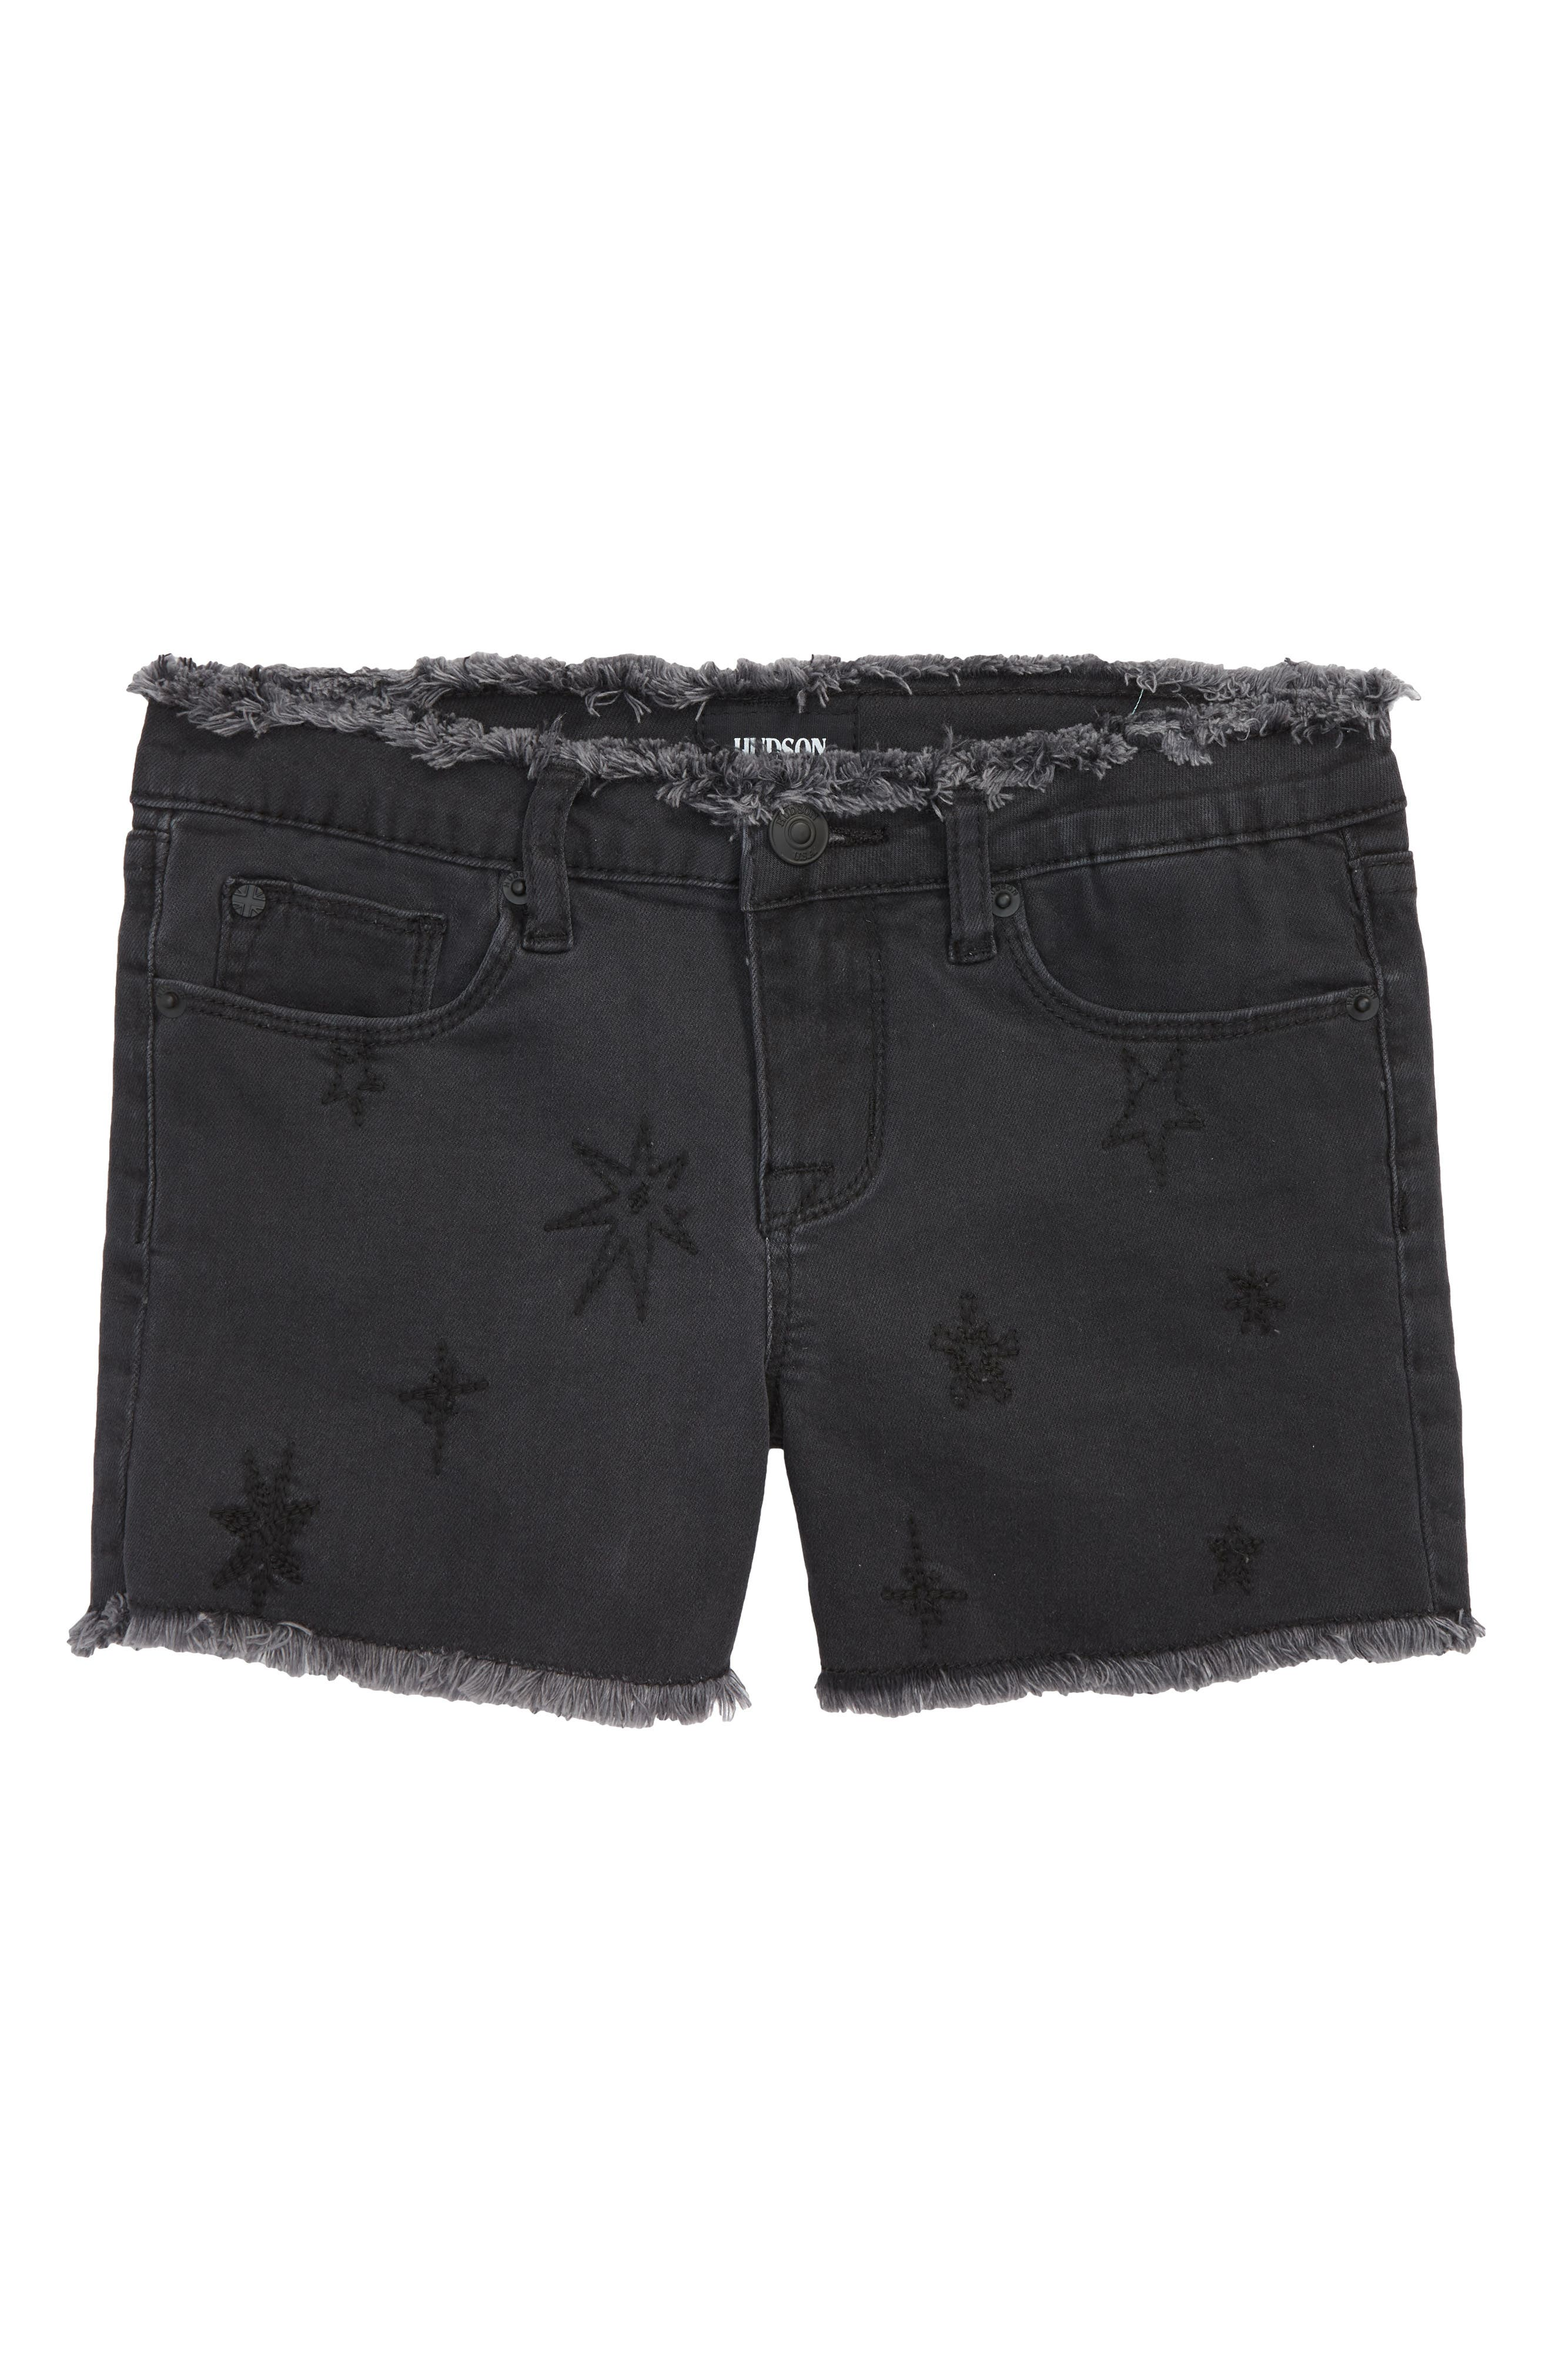 Hudson Kids Starry Night Embroidered Cutoff Stretch Twill Shorts (Big Girls)